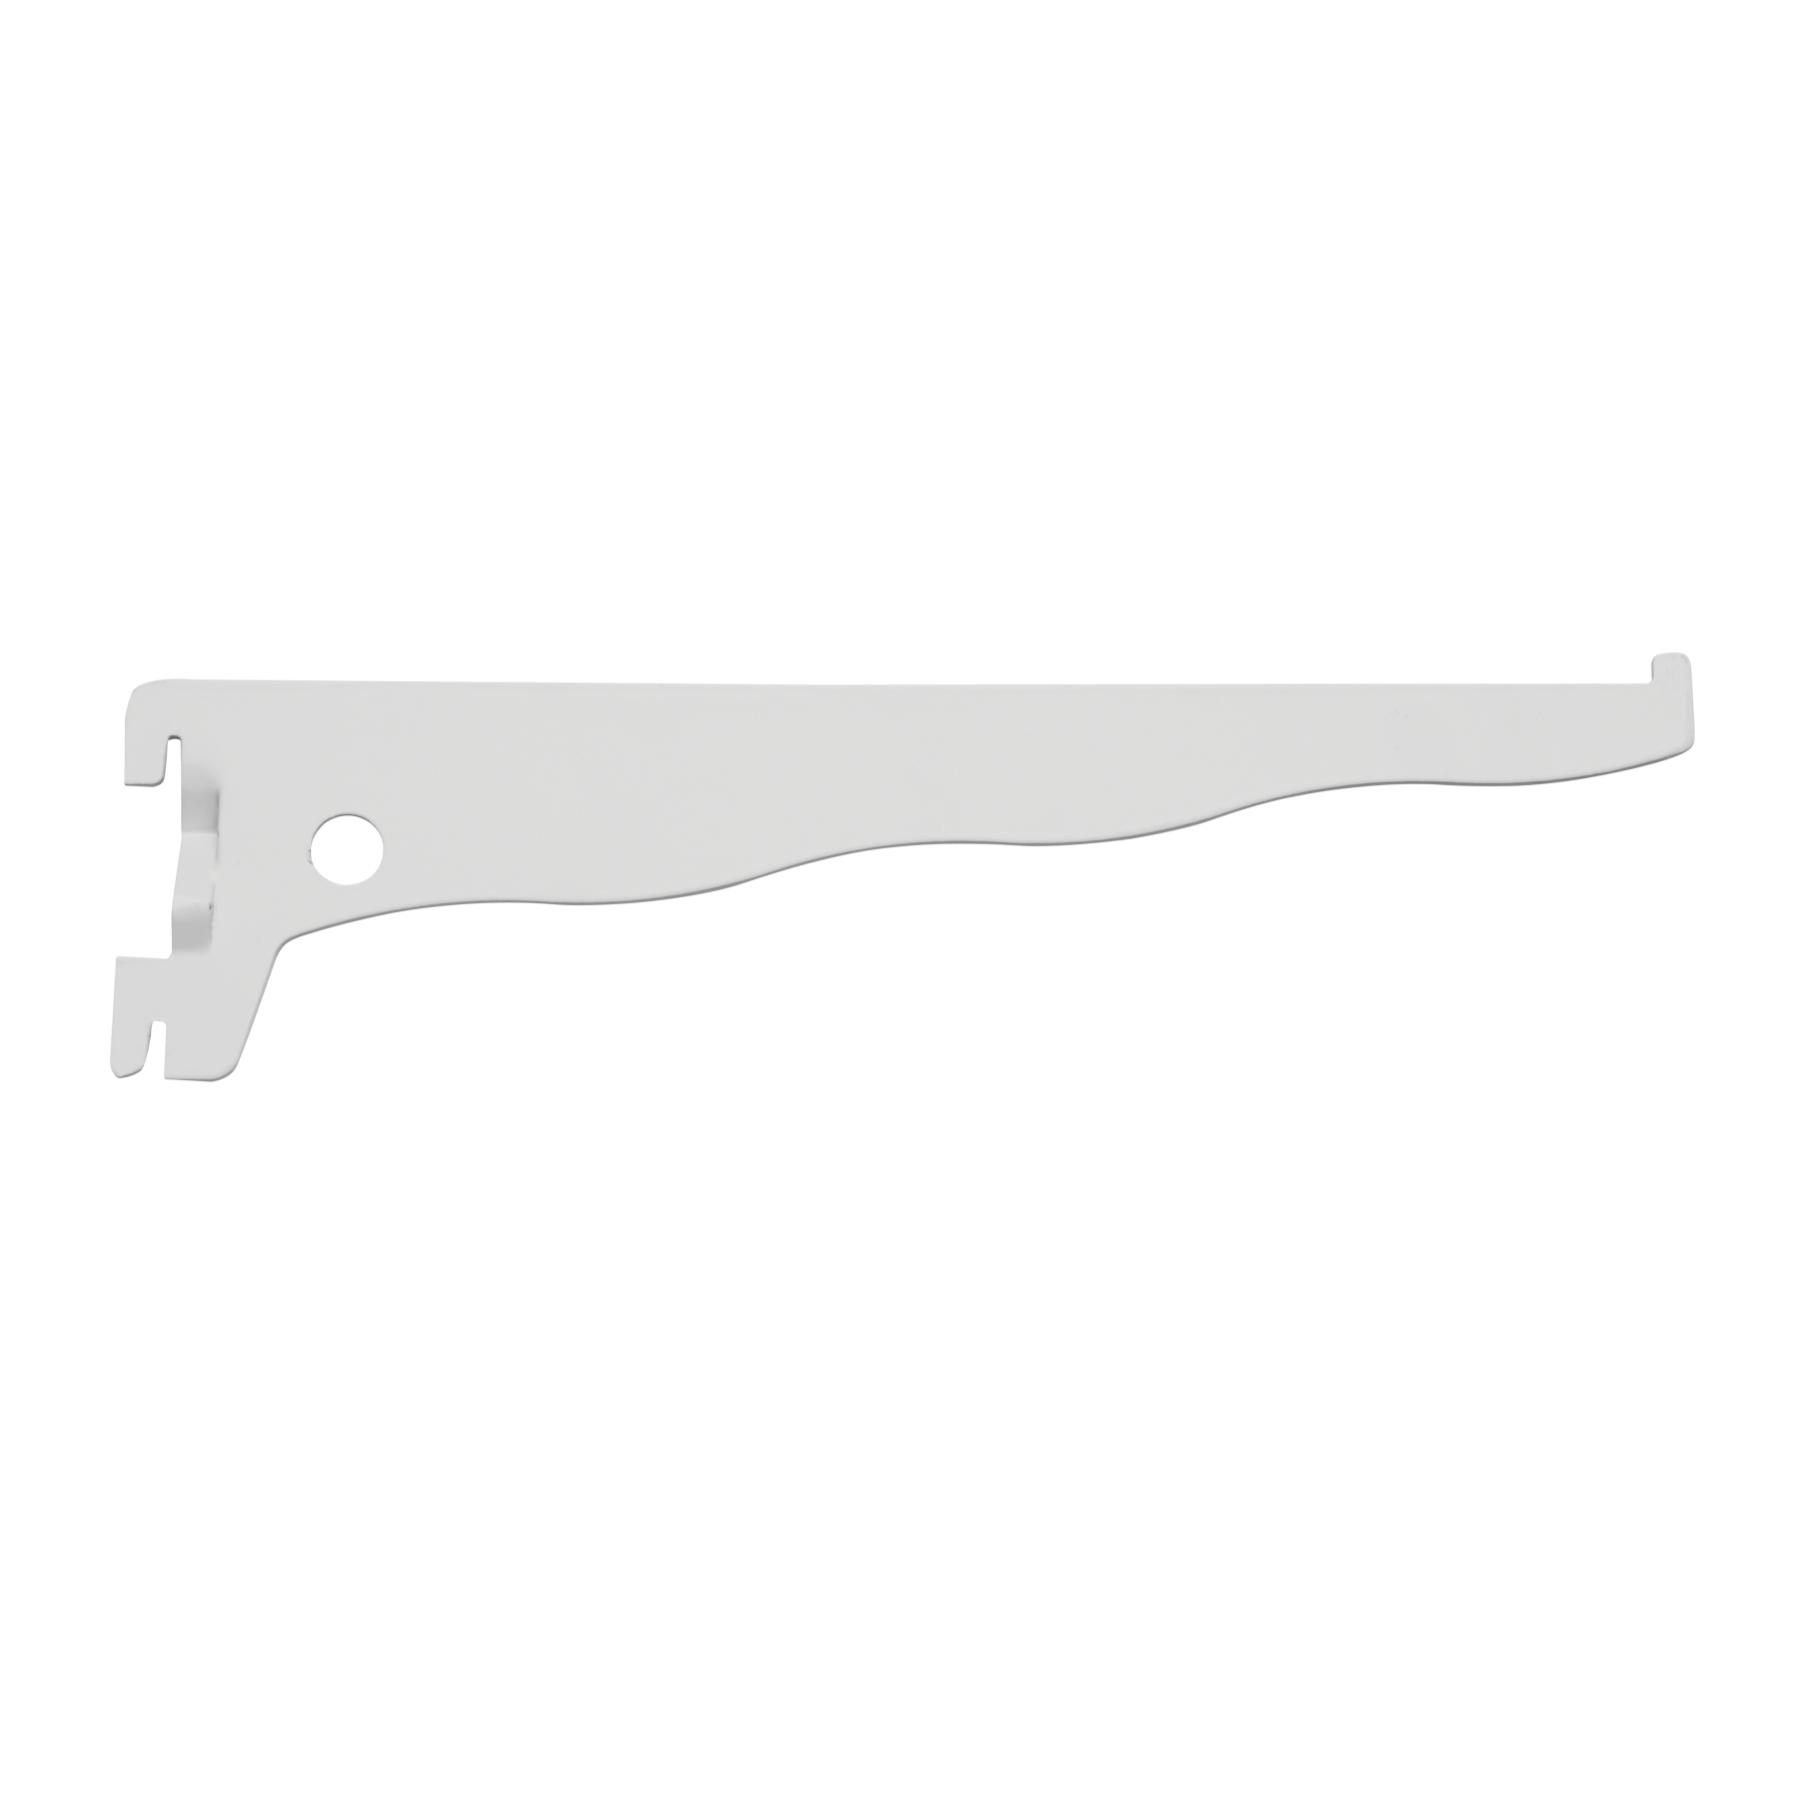 Suporte para Trilho de Aco 25 cm Branco 025 - Prat-k